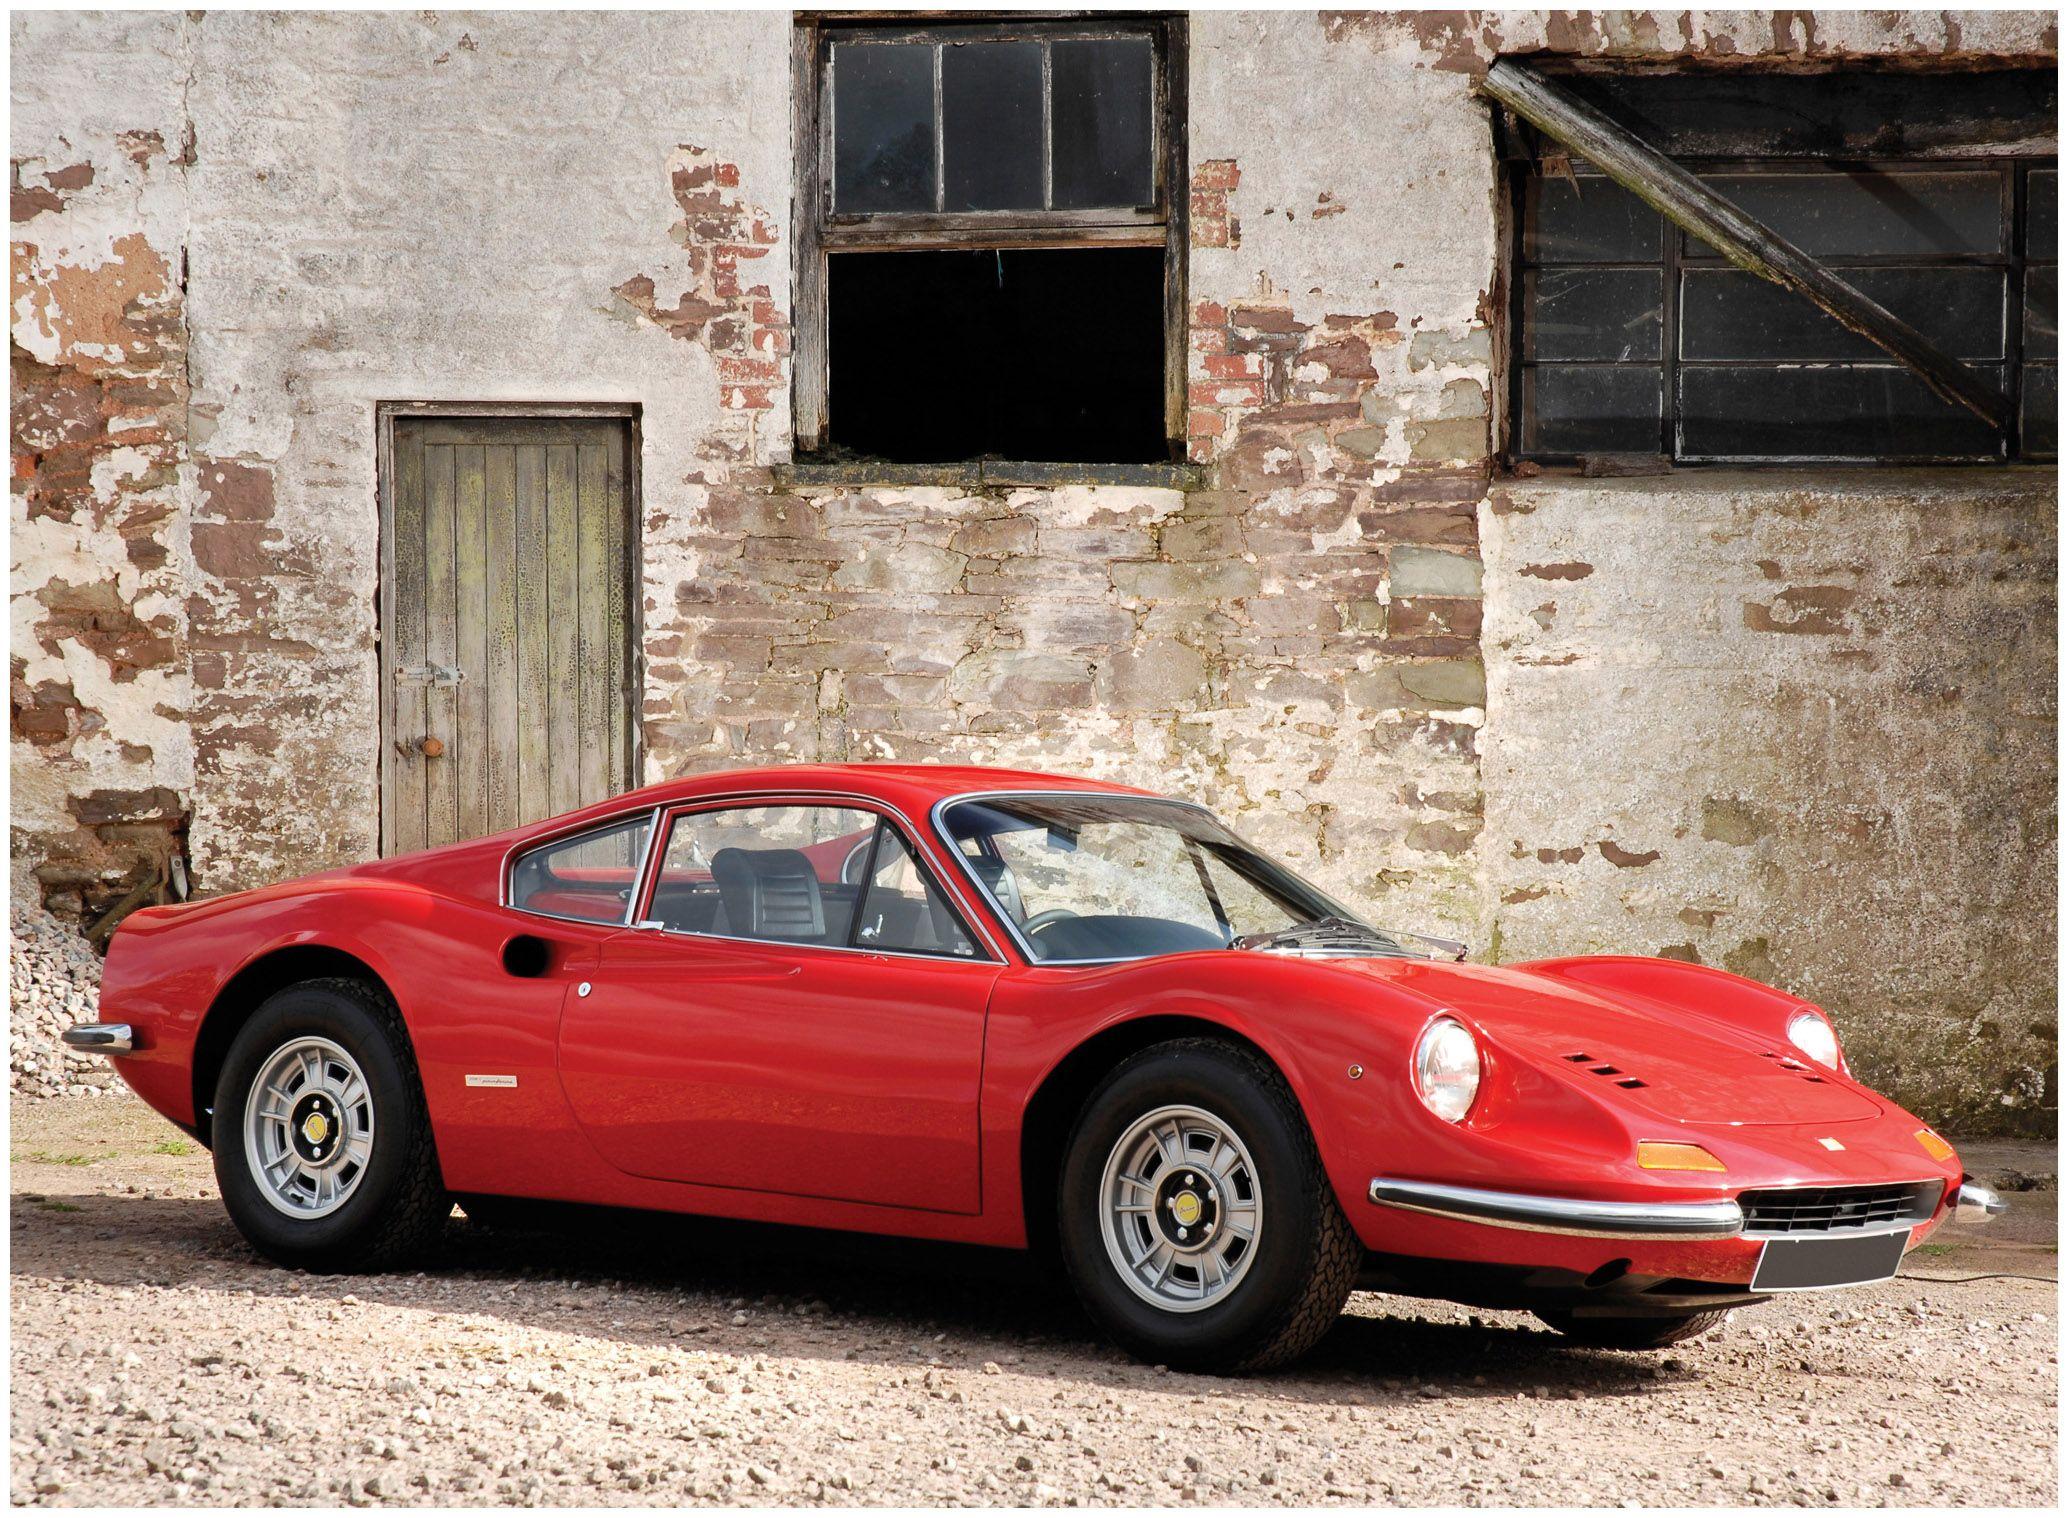 Ferrari Dino 246 GT '1969–74 | Ferrari, Dream garage and Cars